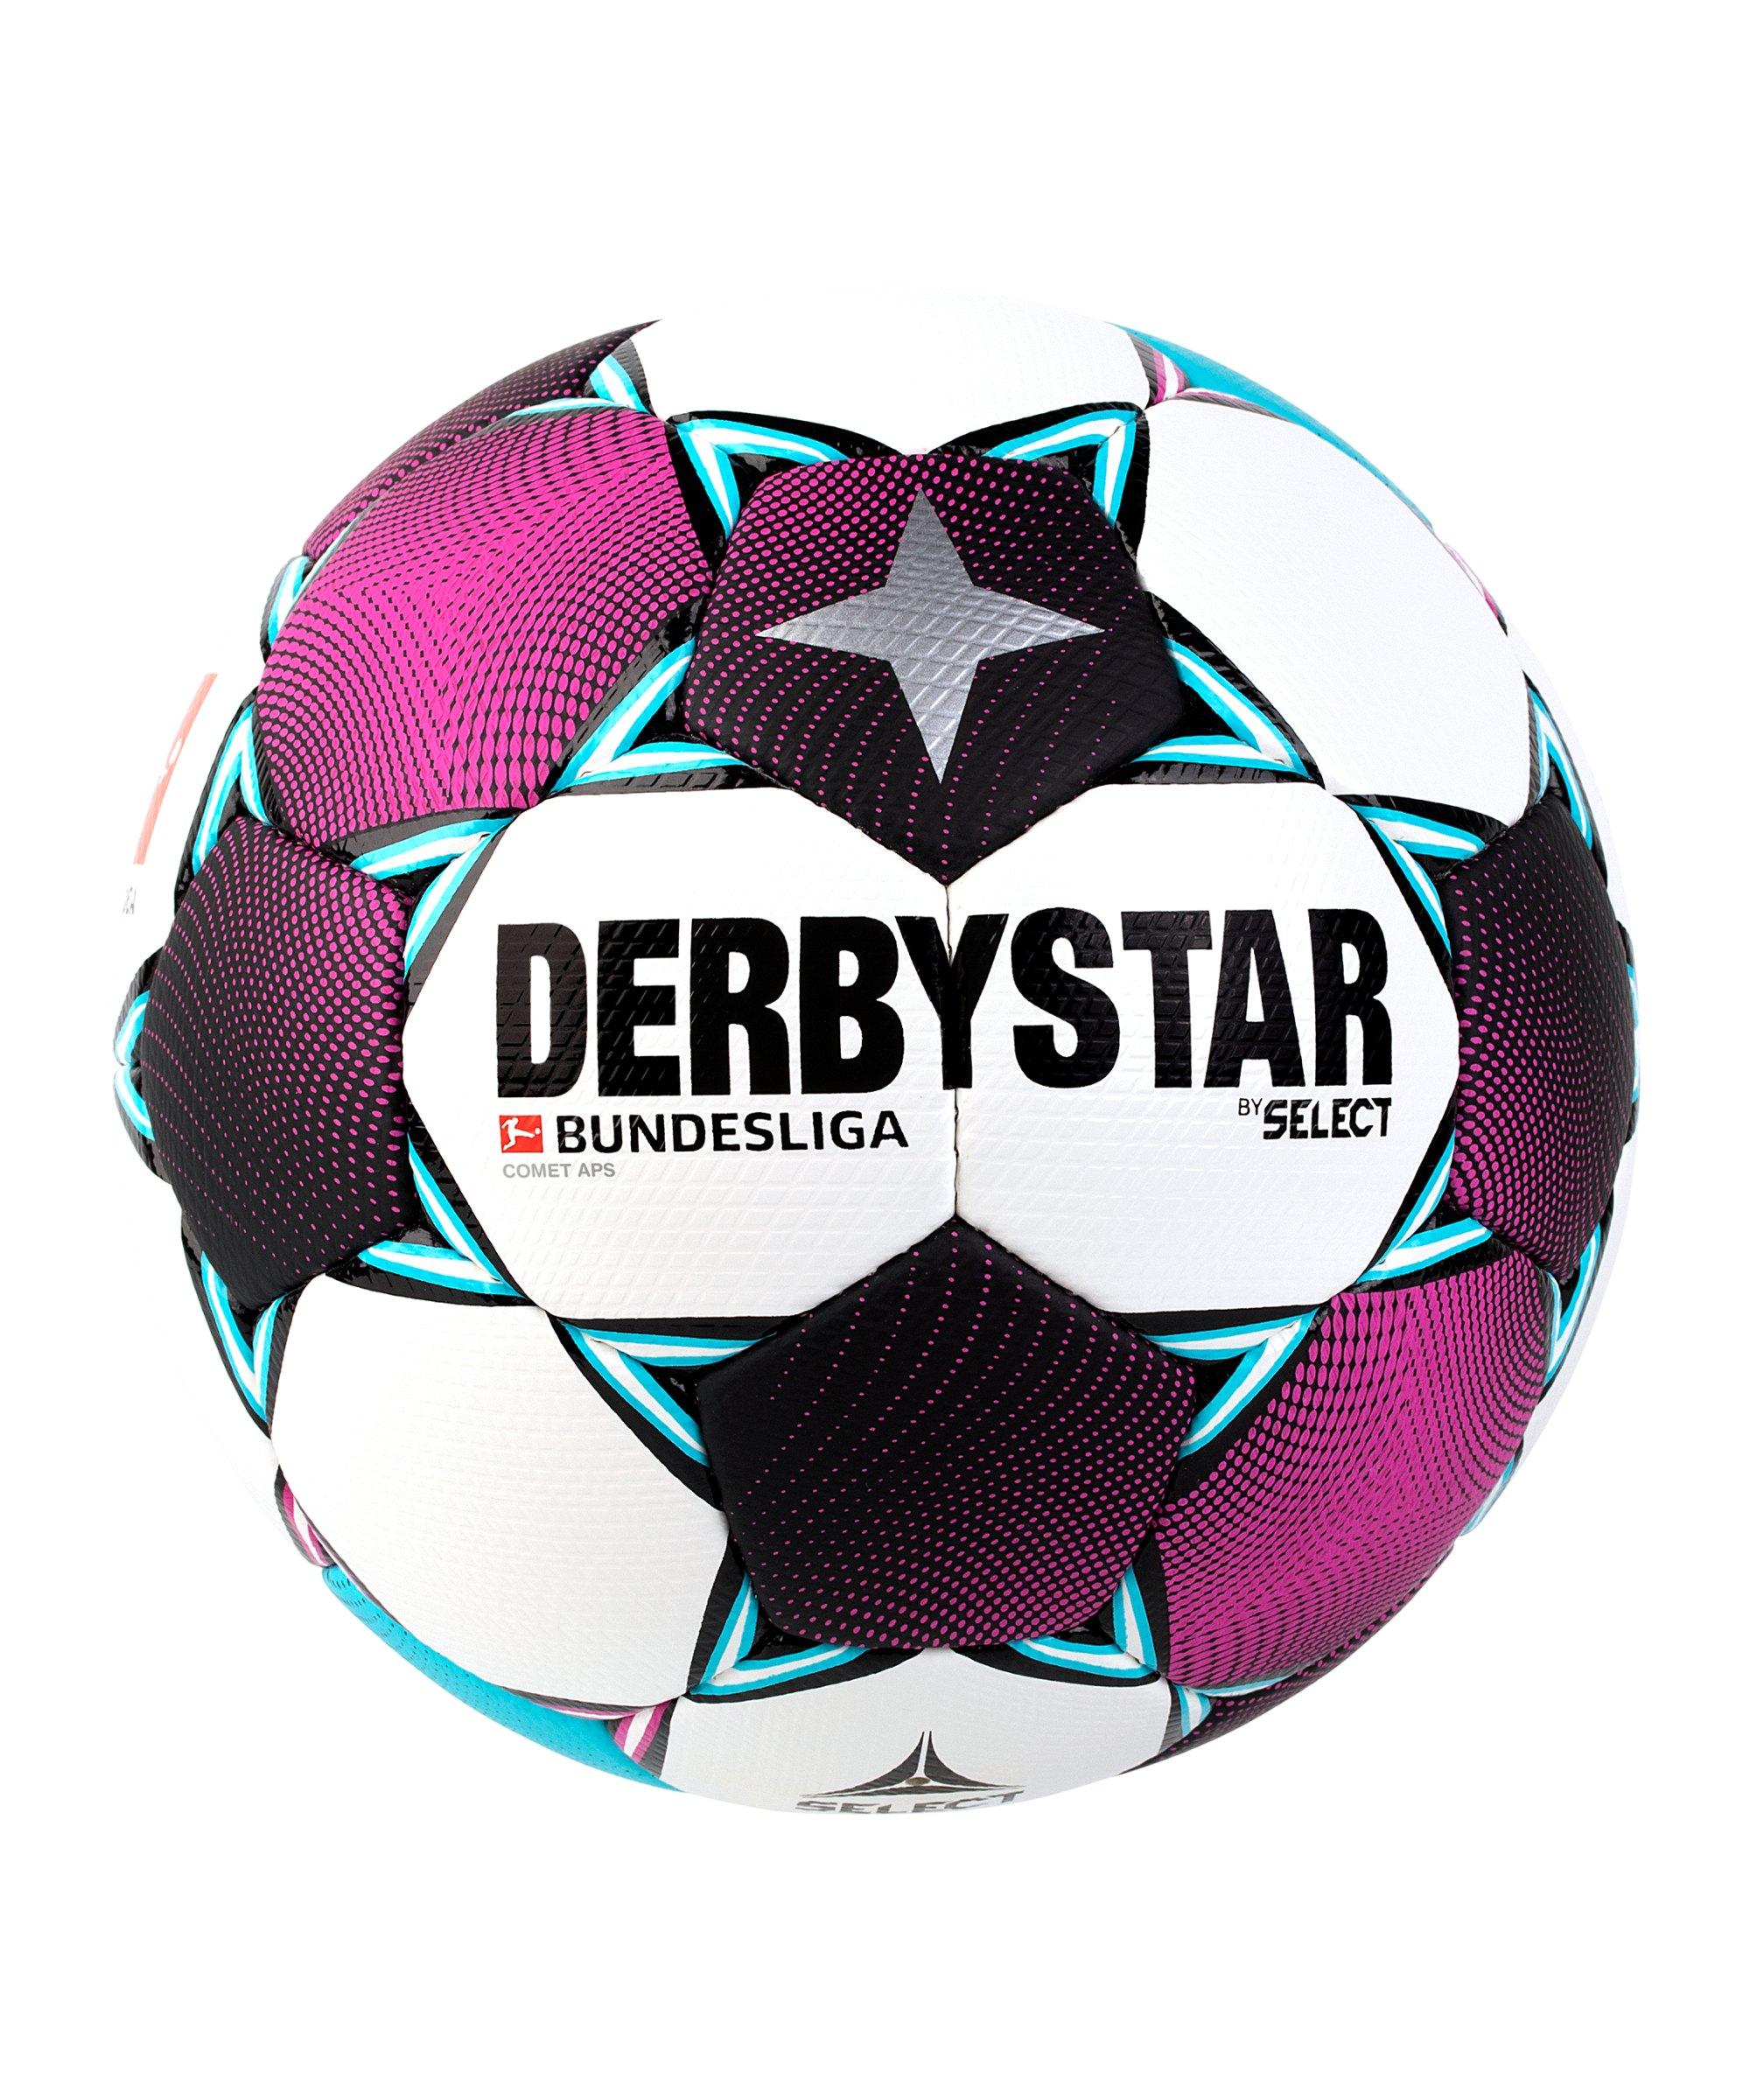 Derbystar Bundesliga Comet APS Spielball Weiss F020 - weiss